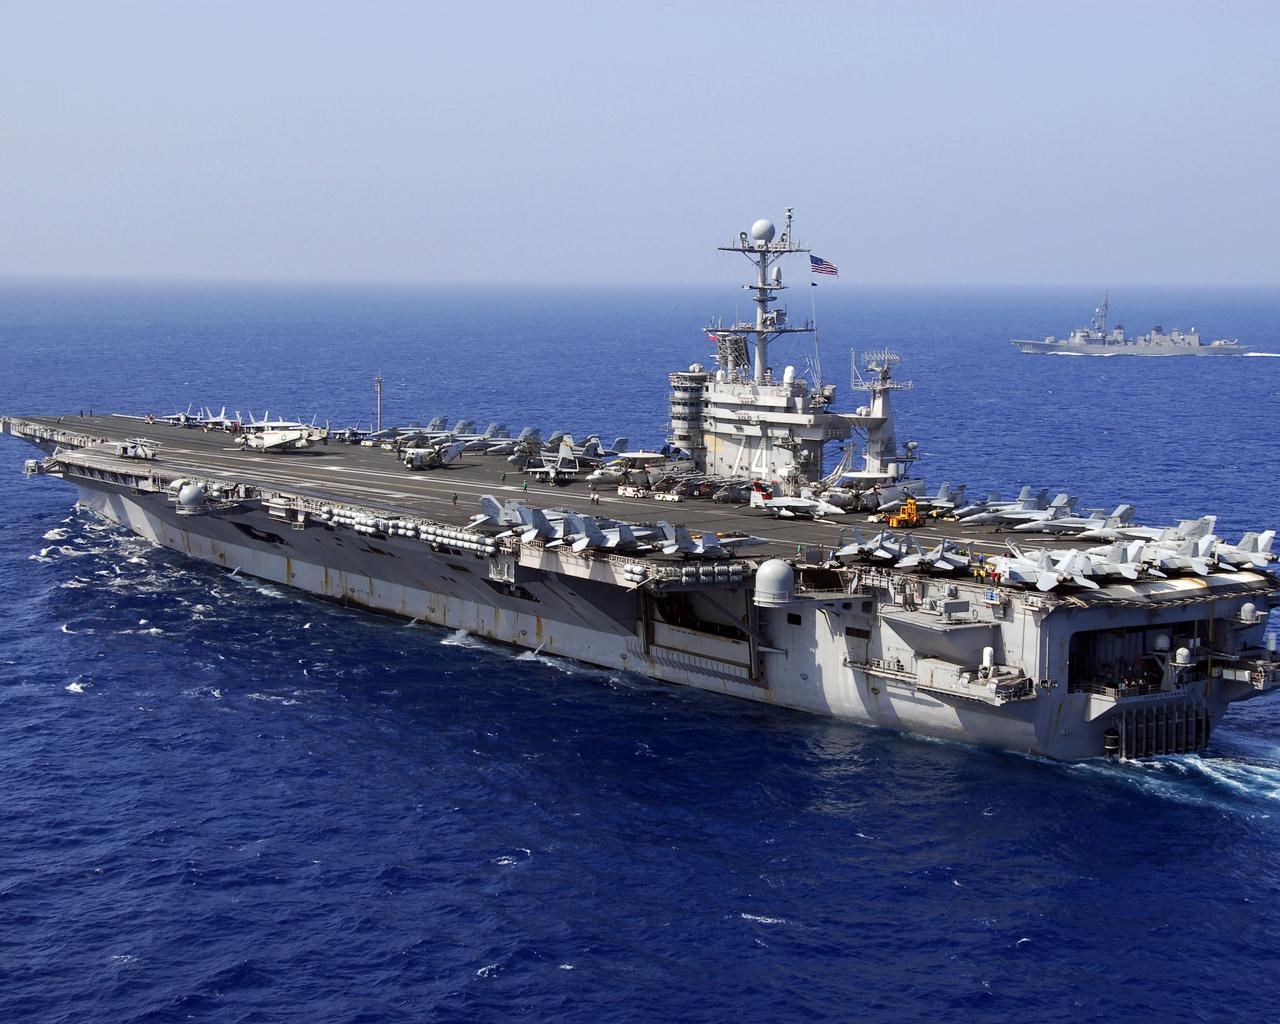 USS John C. Stennis